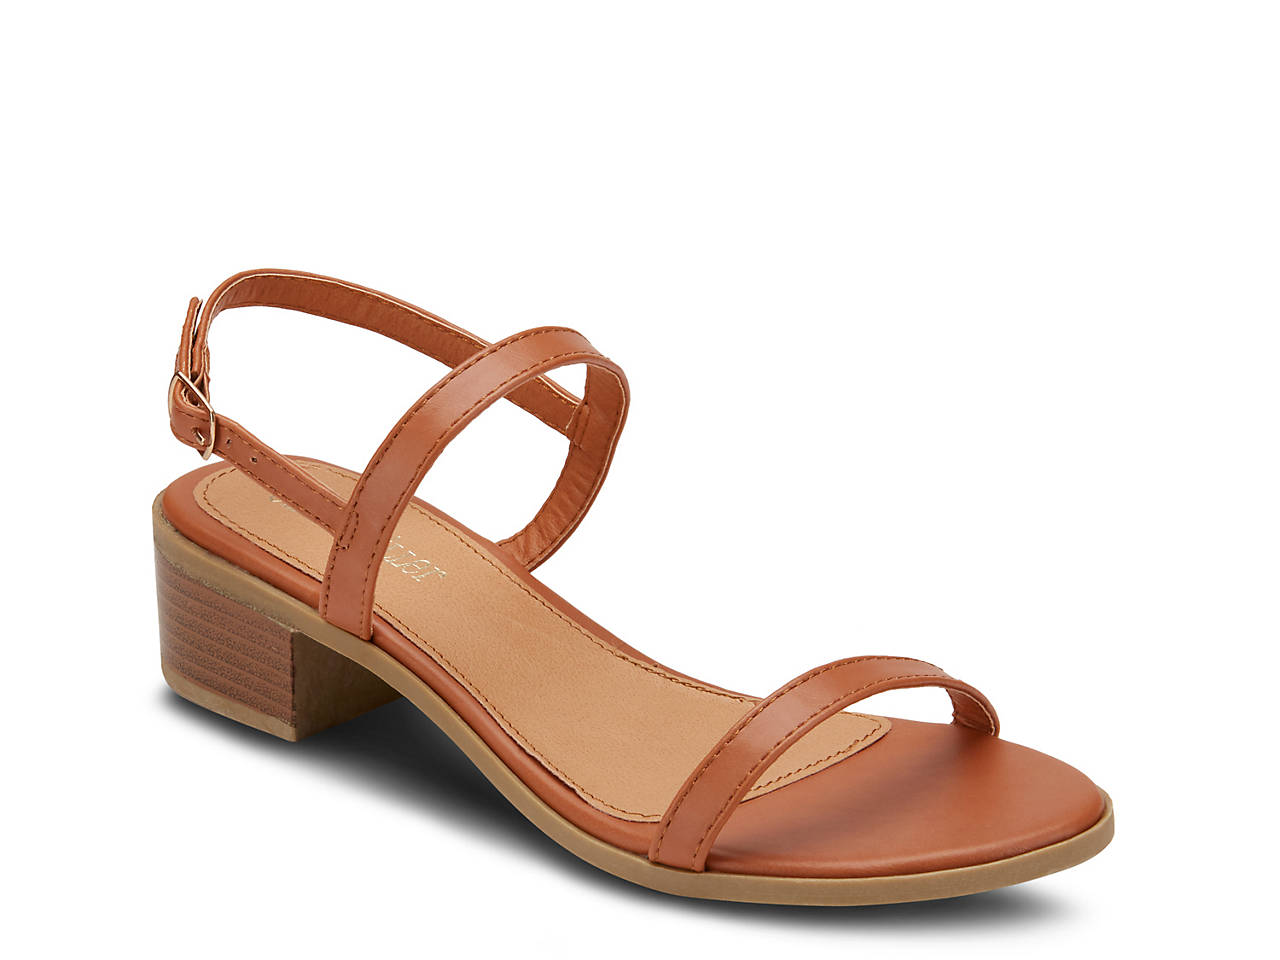 6e1a7470c42 Olivia Miller Rise And Shine Sandal Women s Shoes